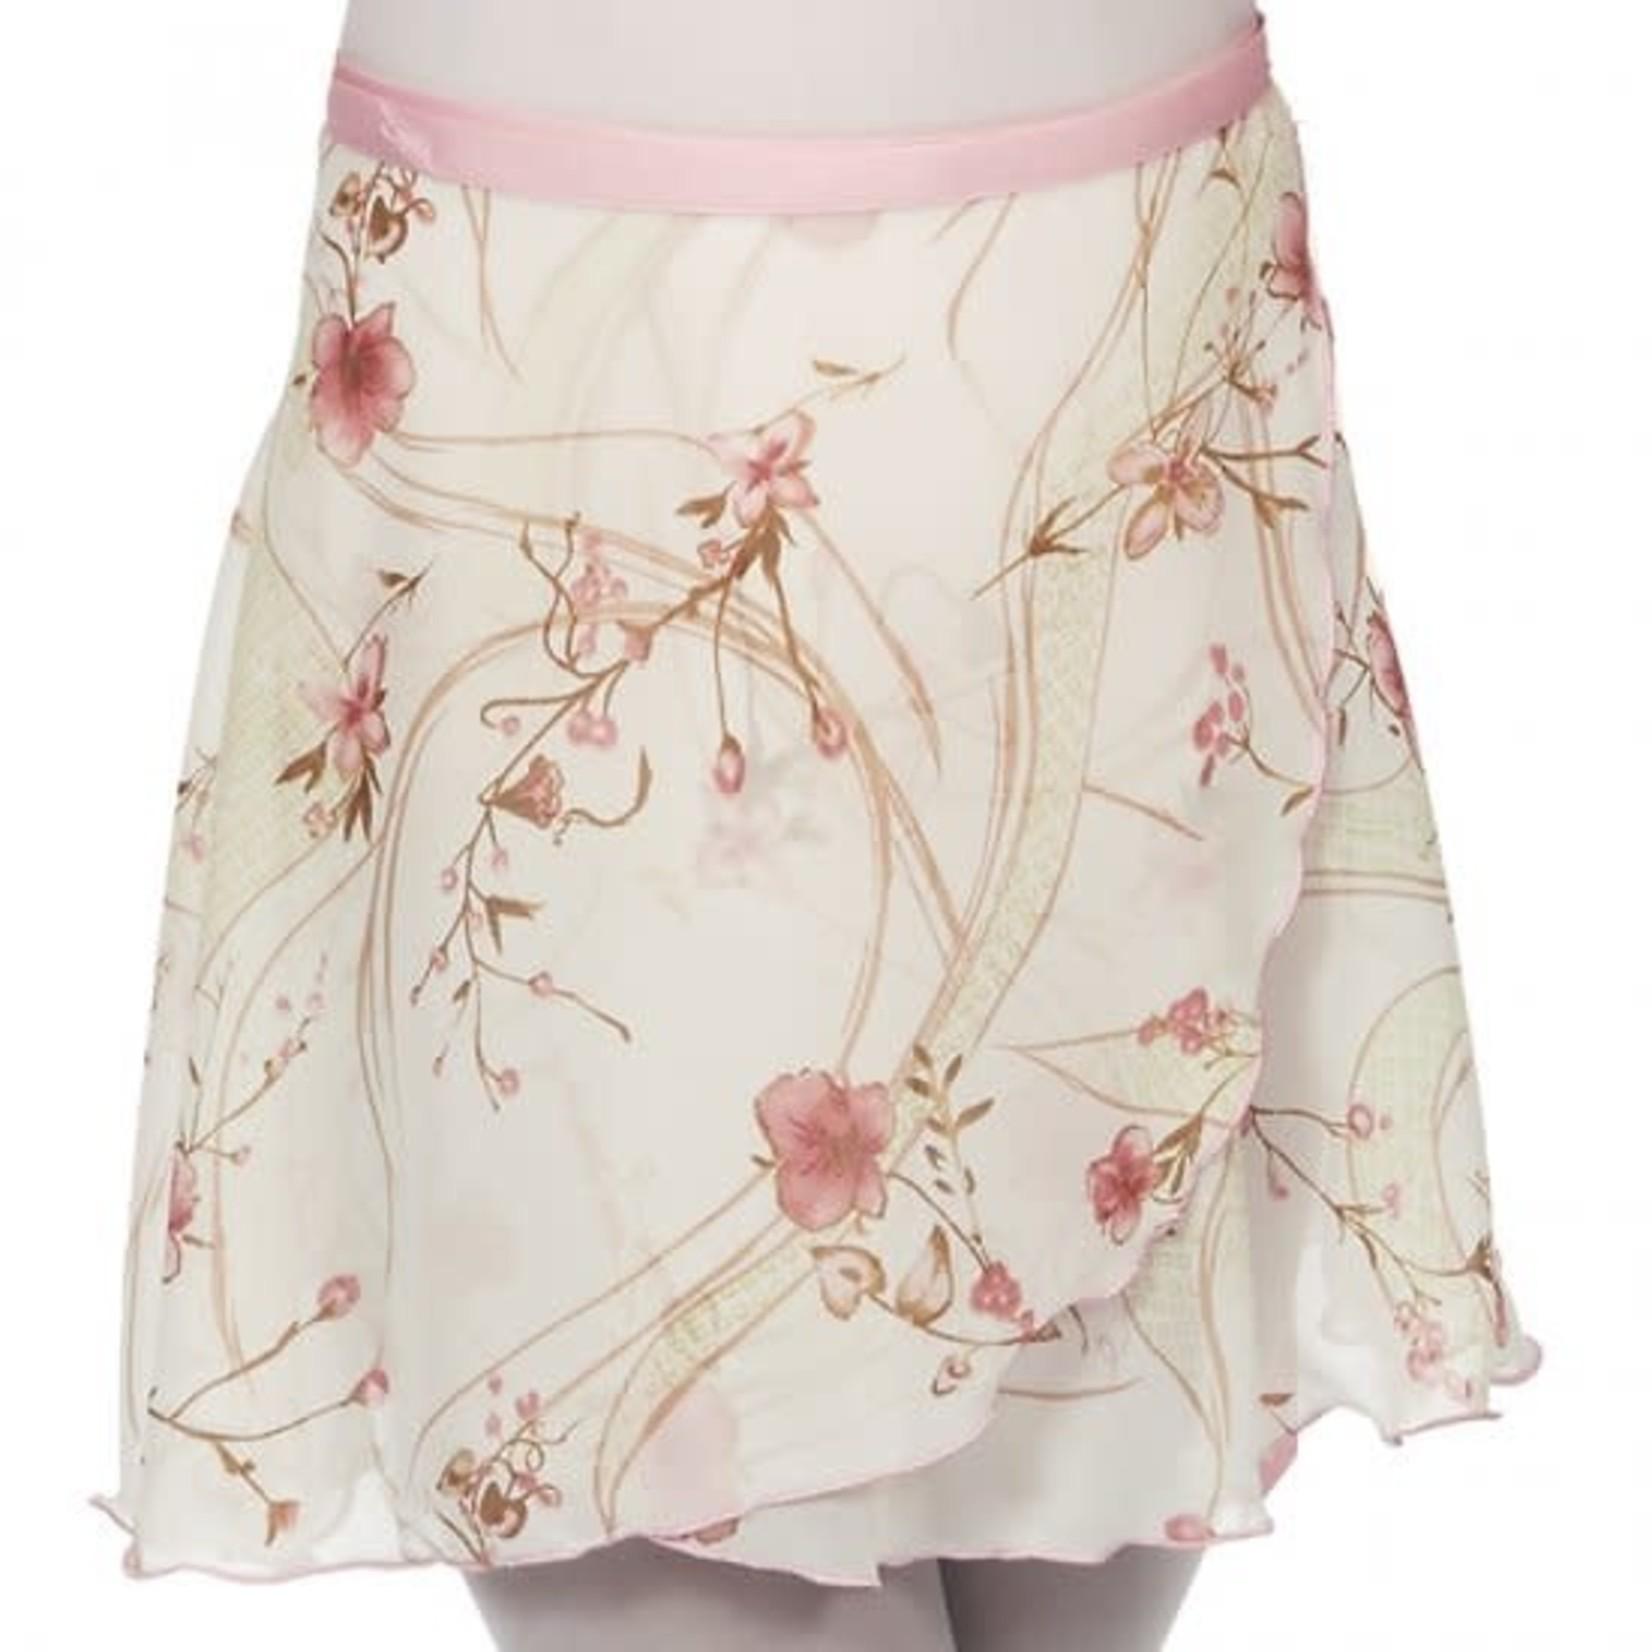 Dasha Designs Dasha Designs 4483Pk Pink Zen Garden Wrap